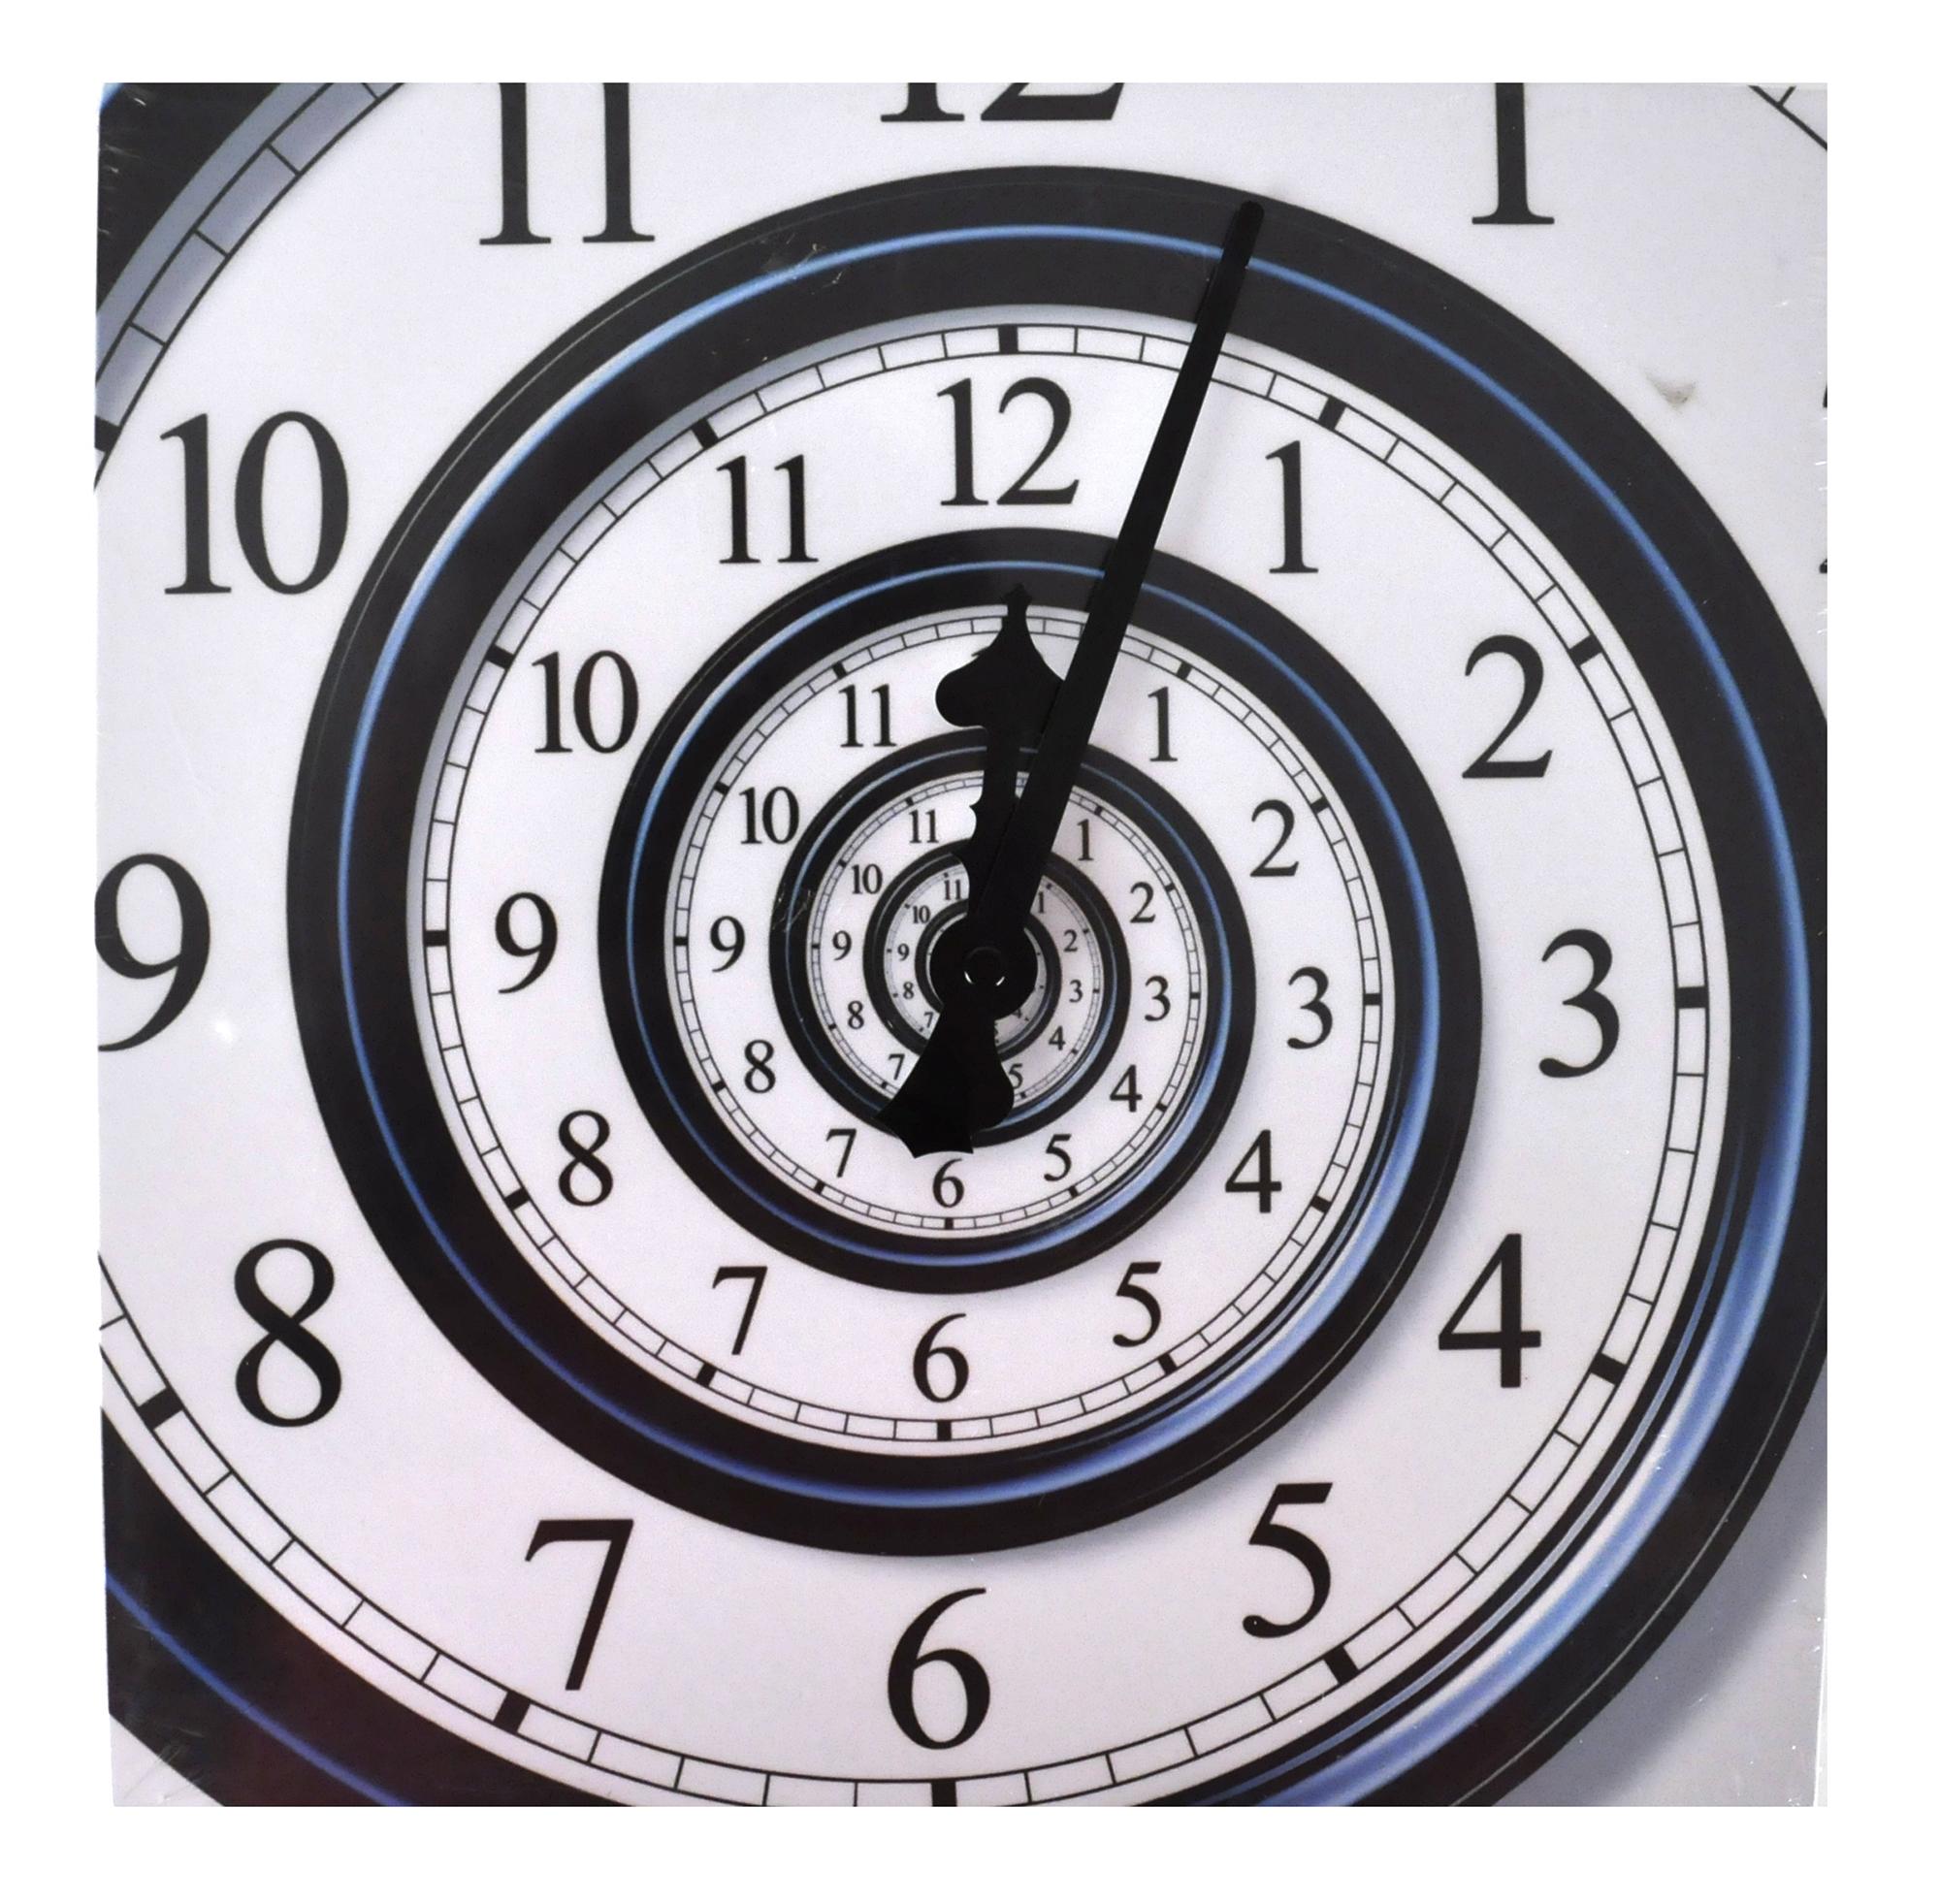 Best Large Wall Clocks Infinite Spiral Wall Clock Pink Cat Shop